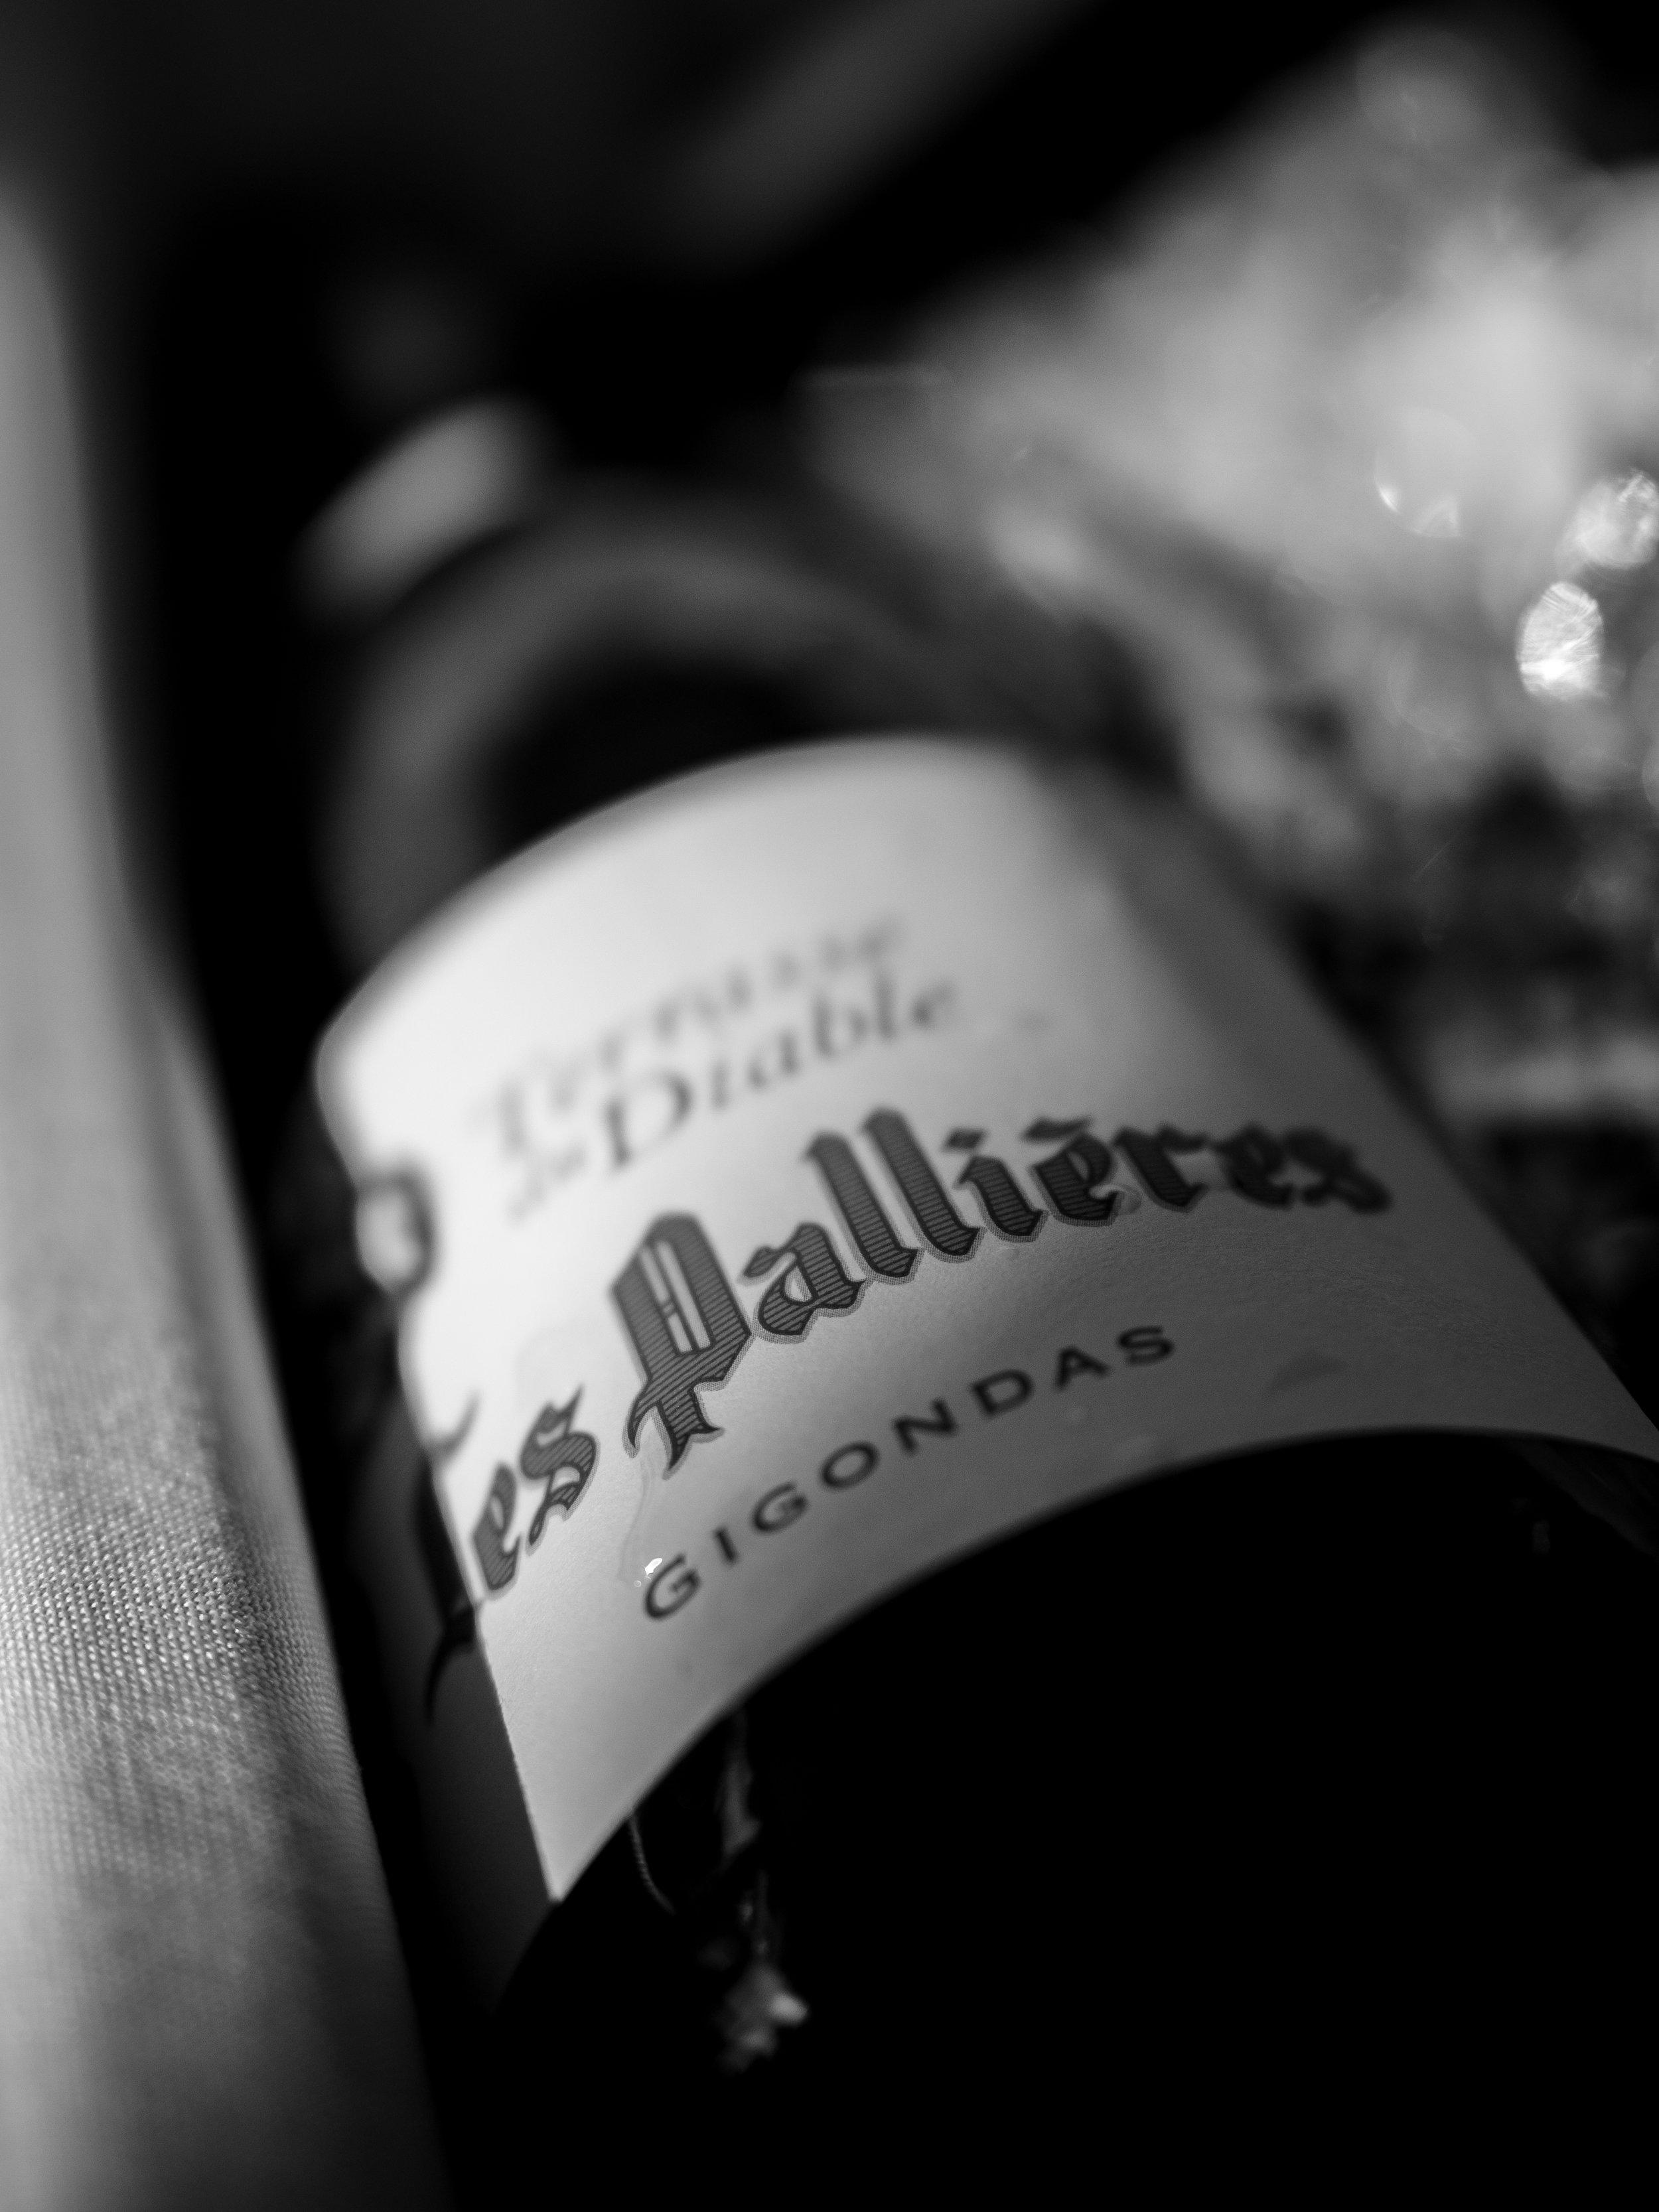 Vinous Label Elucidation - Decoding Rhone Valley Wine Lavels - Gigondas Black and White